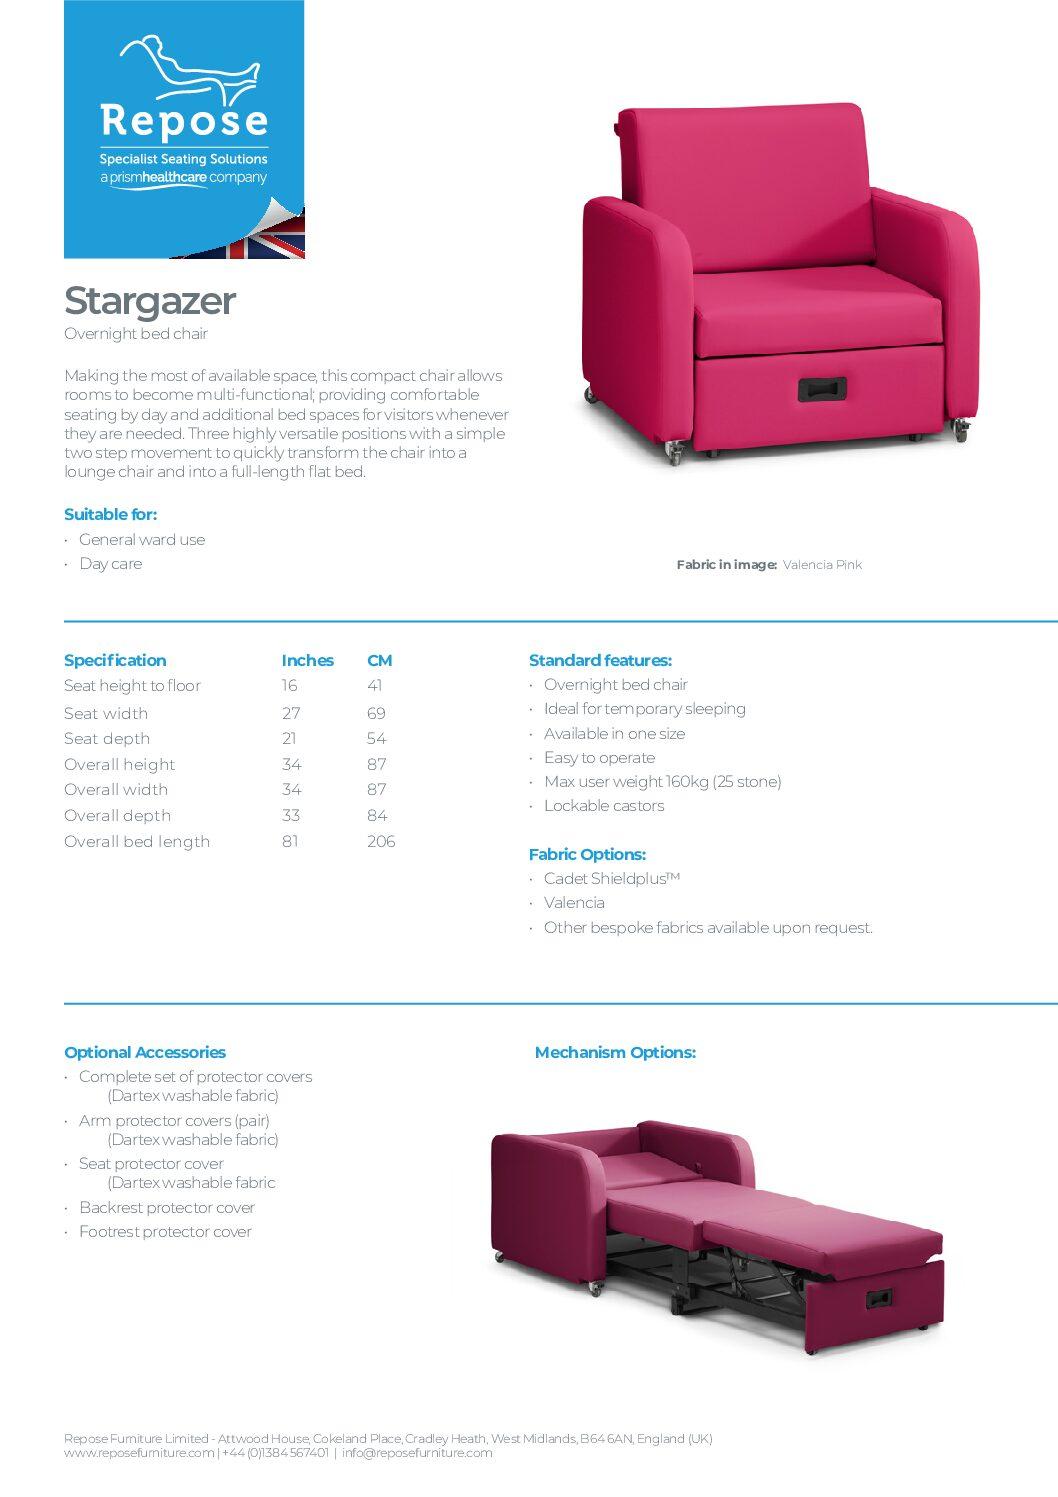 PDF specification Stargazer R5 pdf Repose Furniture Downloads and Brochure Request